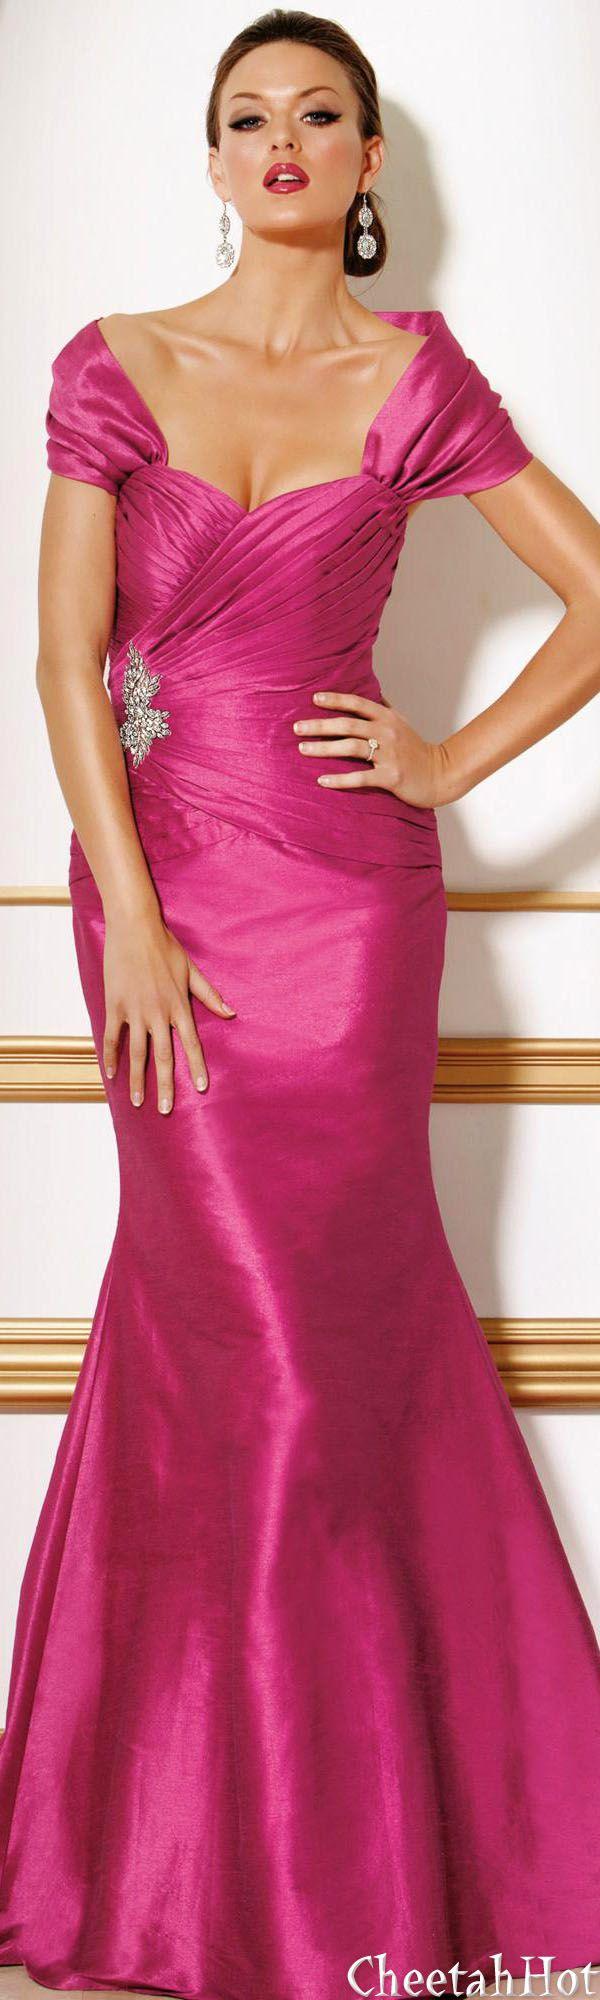 Jovani authentic designer dress elegant long fuchsia gown